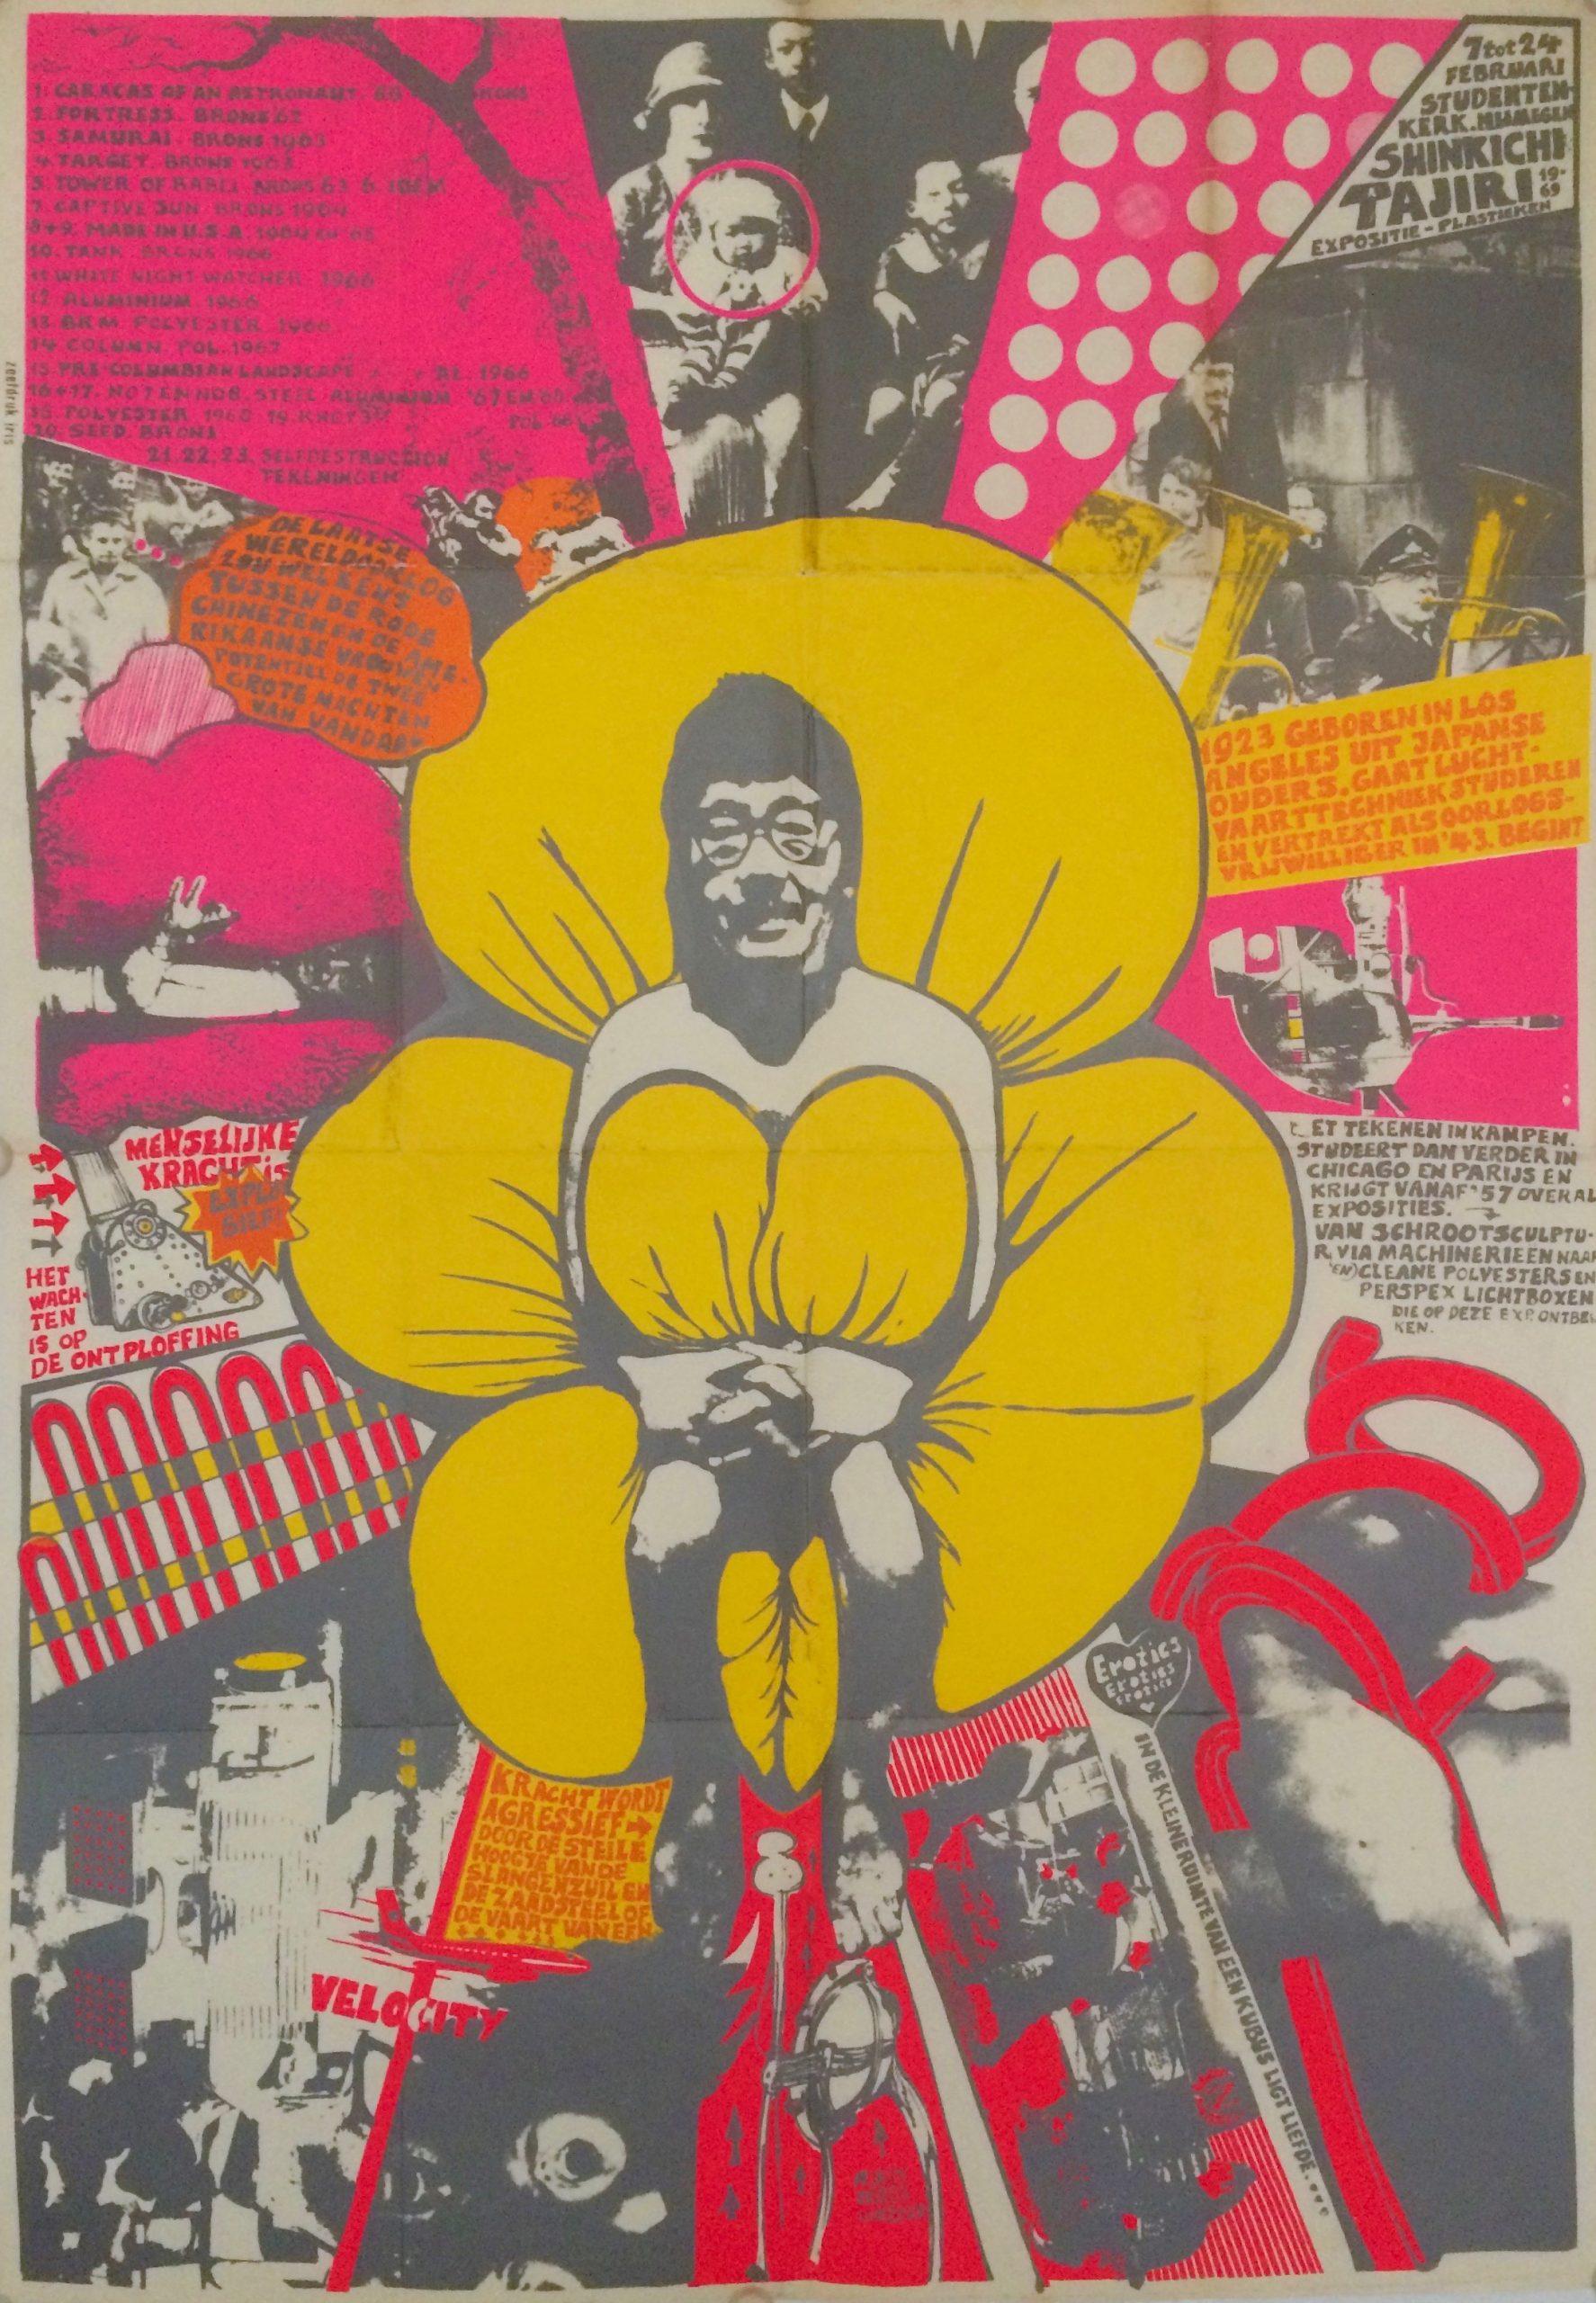 Exhibition Shinkichi Tajiri 1969